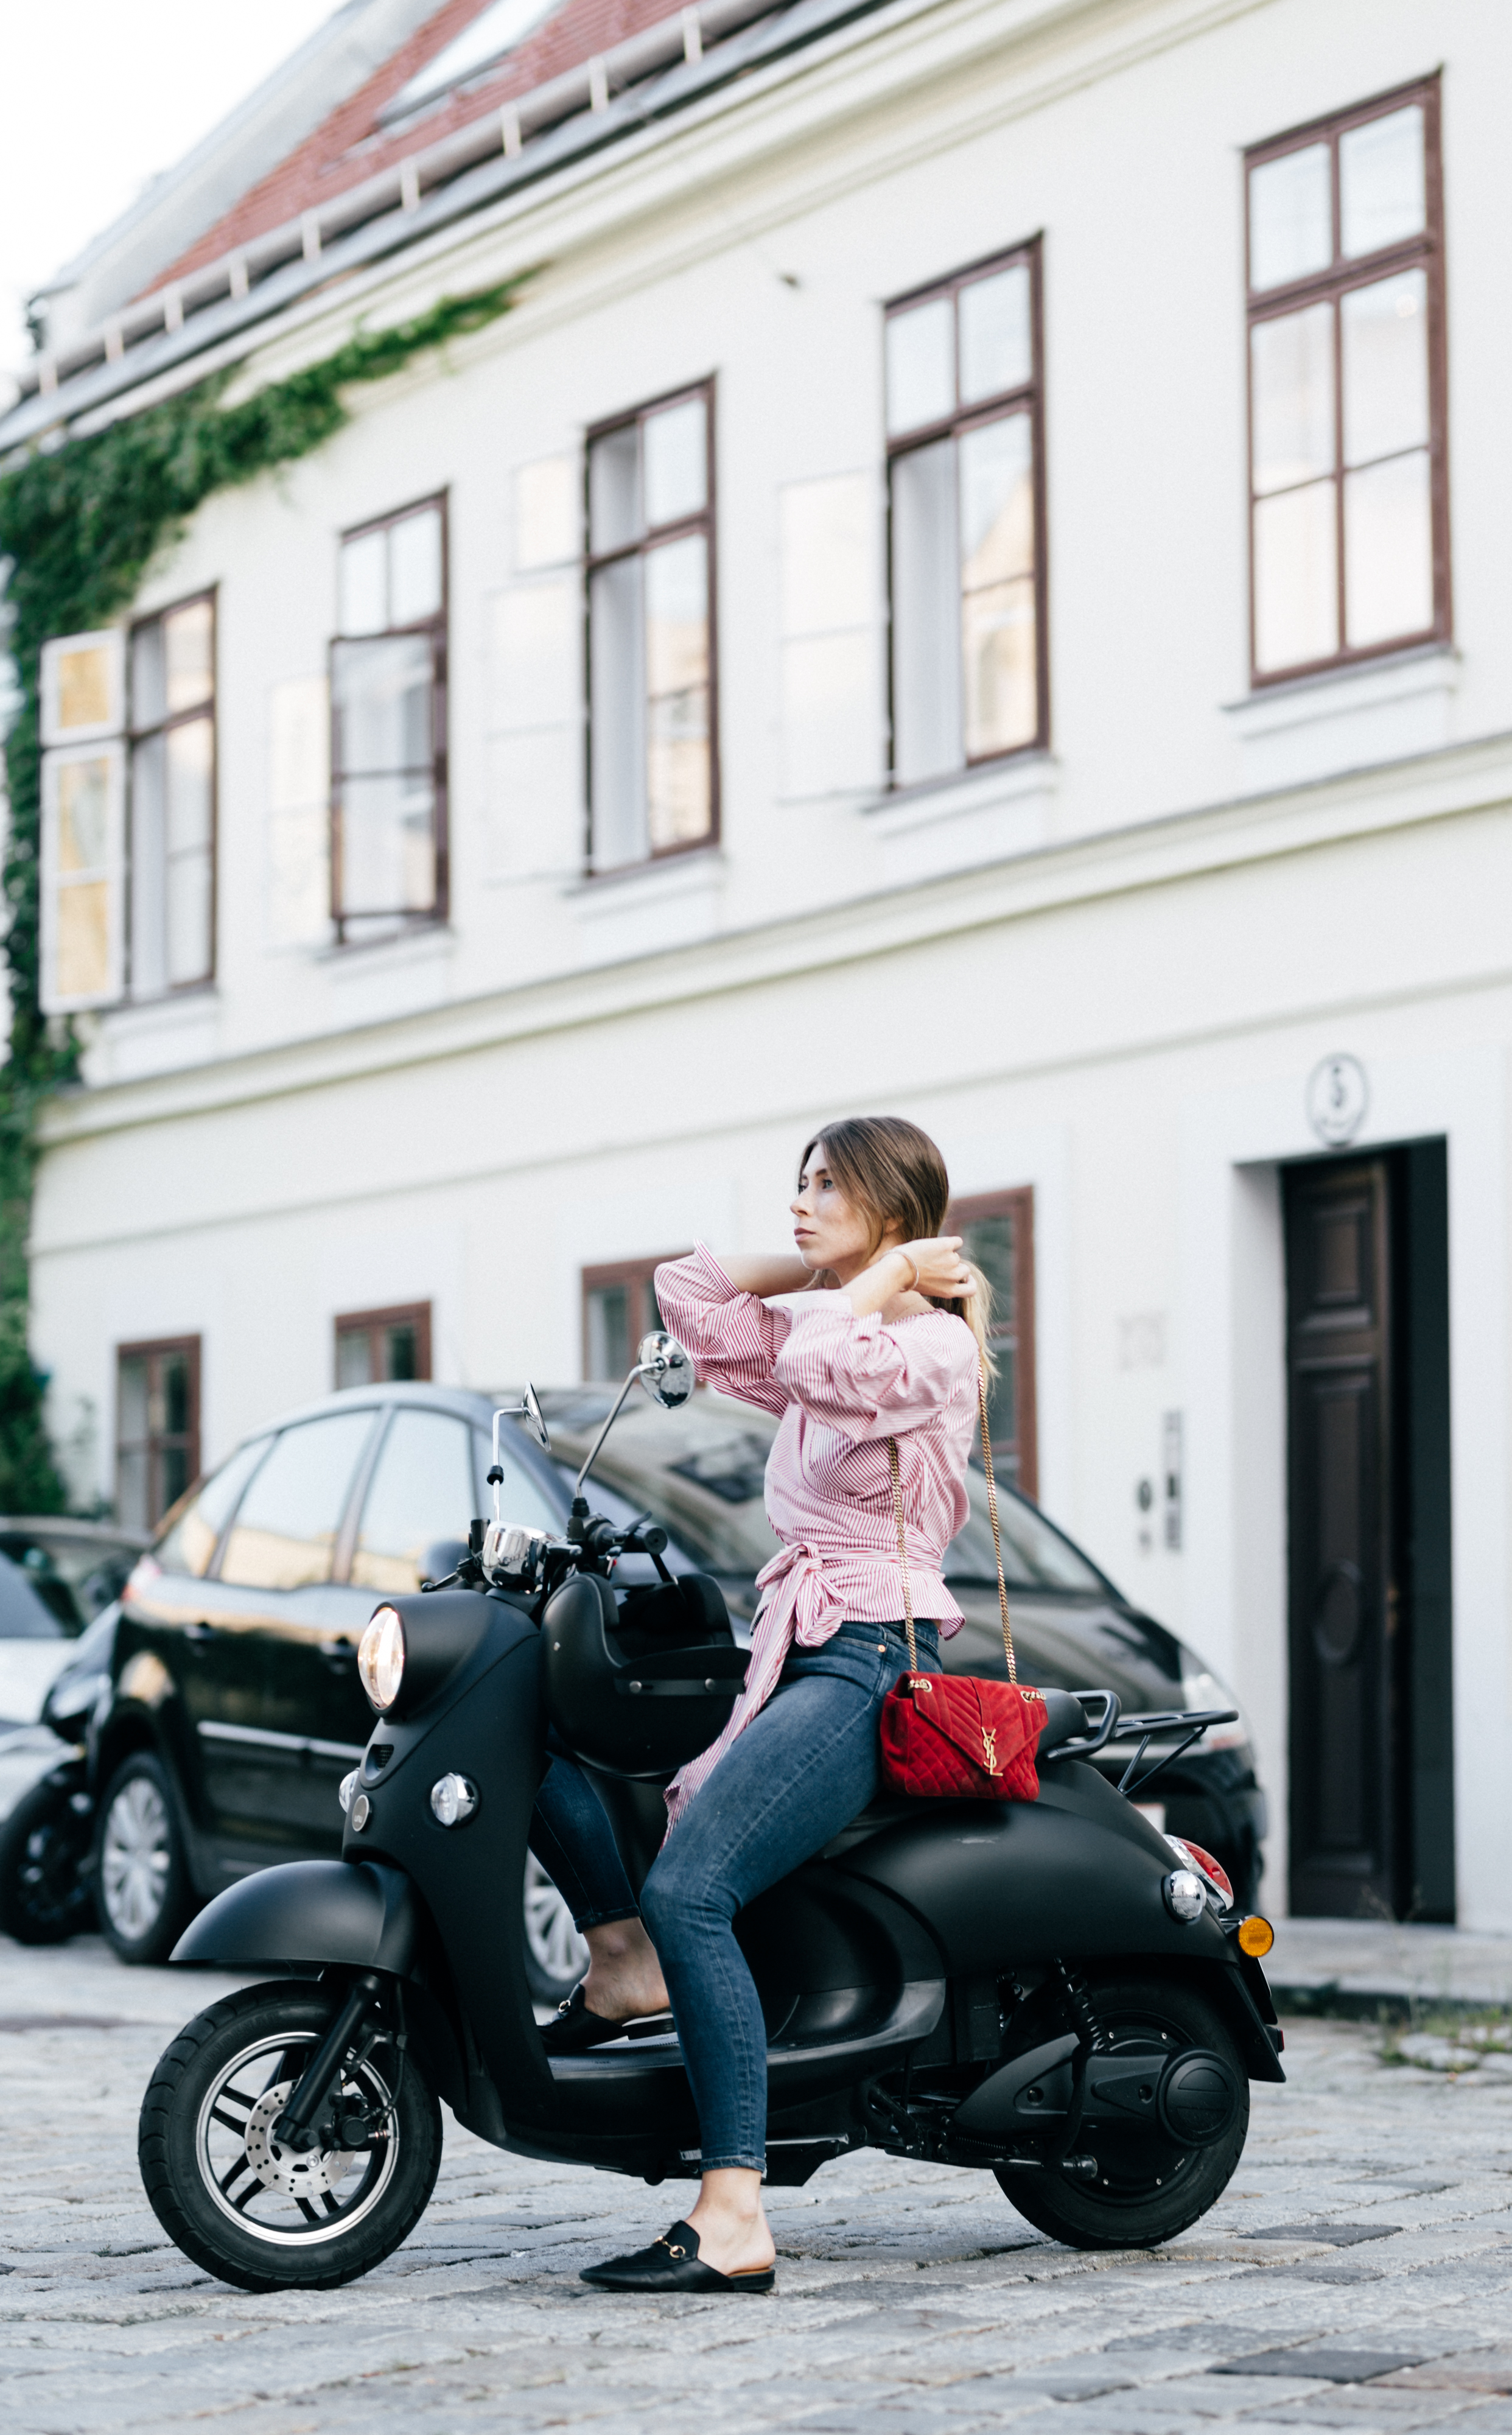 Unu Scooter - Electric Scooter | Bikinis & Passports